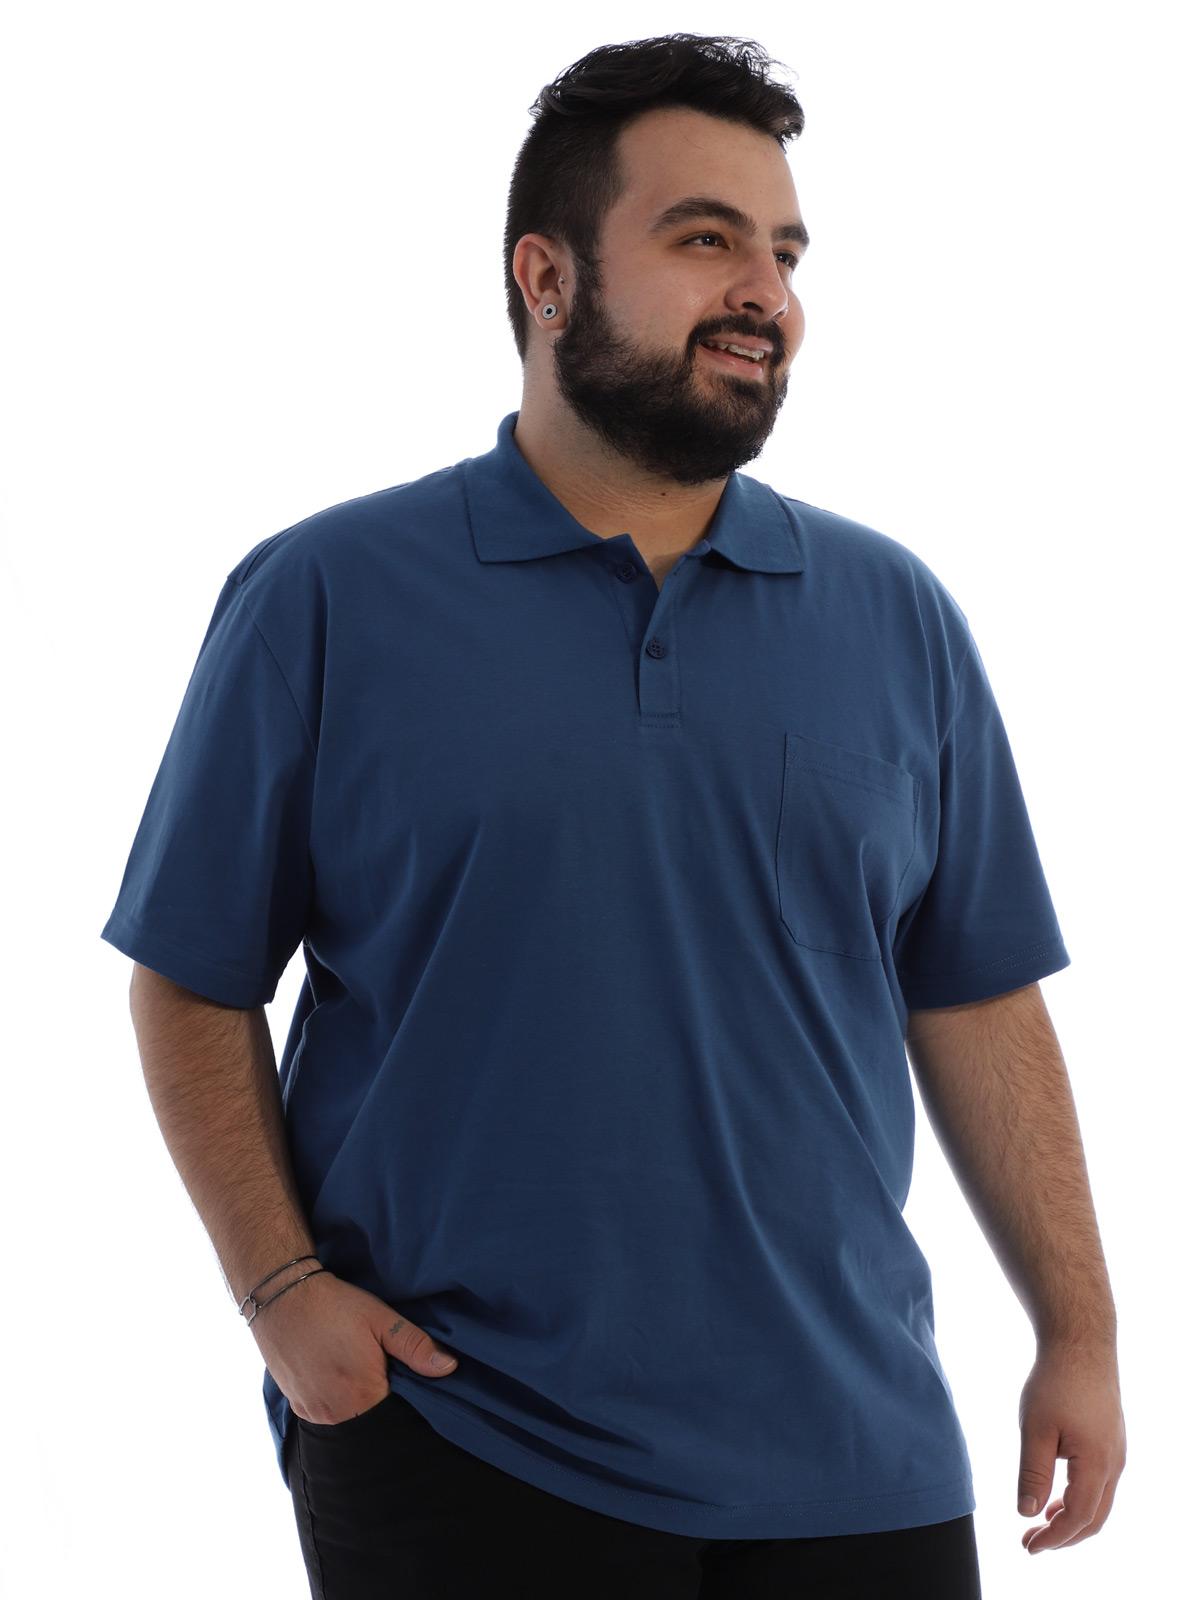 Camisa Polo Plus Size Masculina com Bolso Basica Jeans